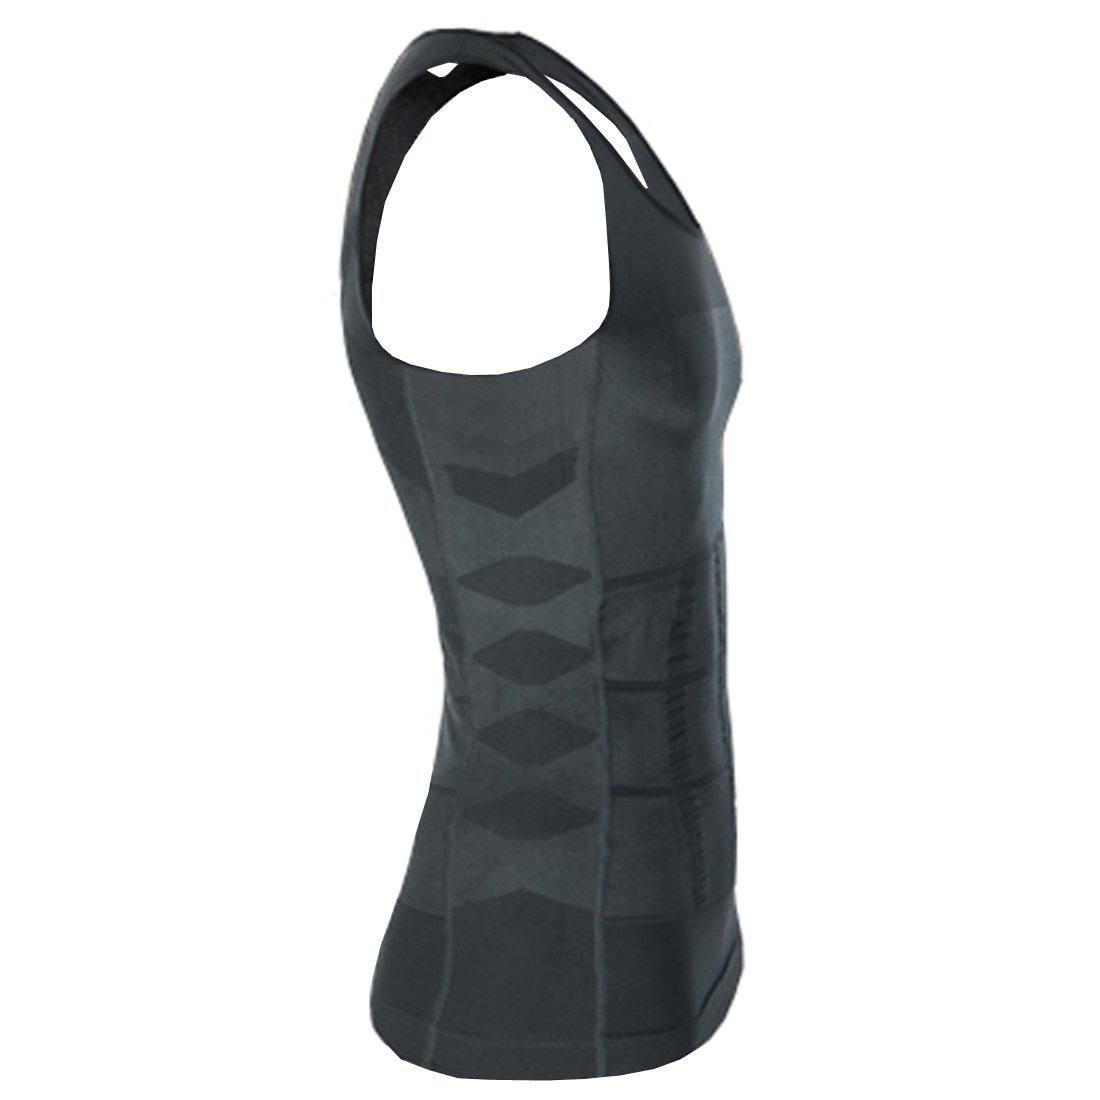 ZEROBODYS Mens Shaper Slimming Sleeveless T-shirt Elastic Body Sculpting Vest SS-M01 Grey